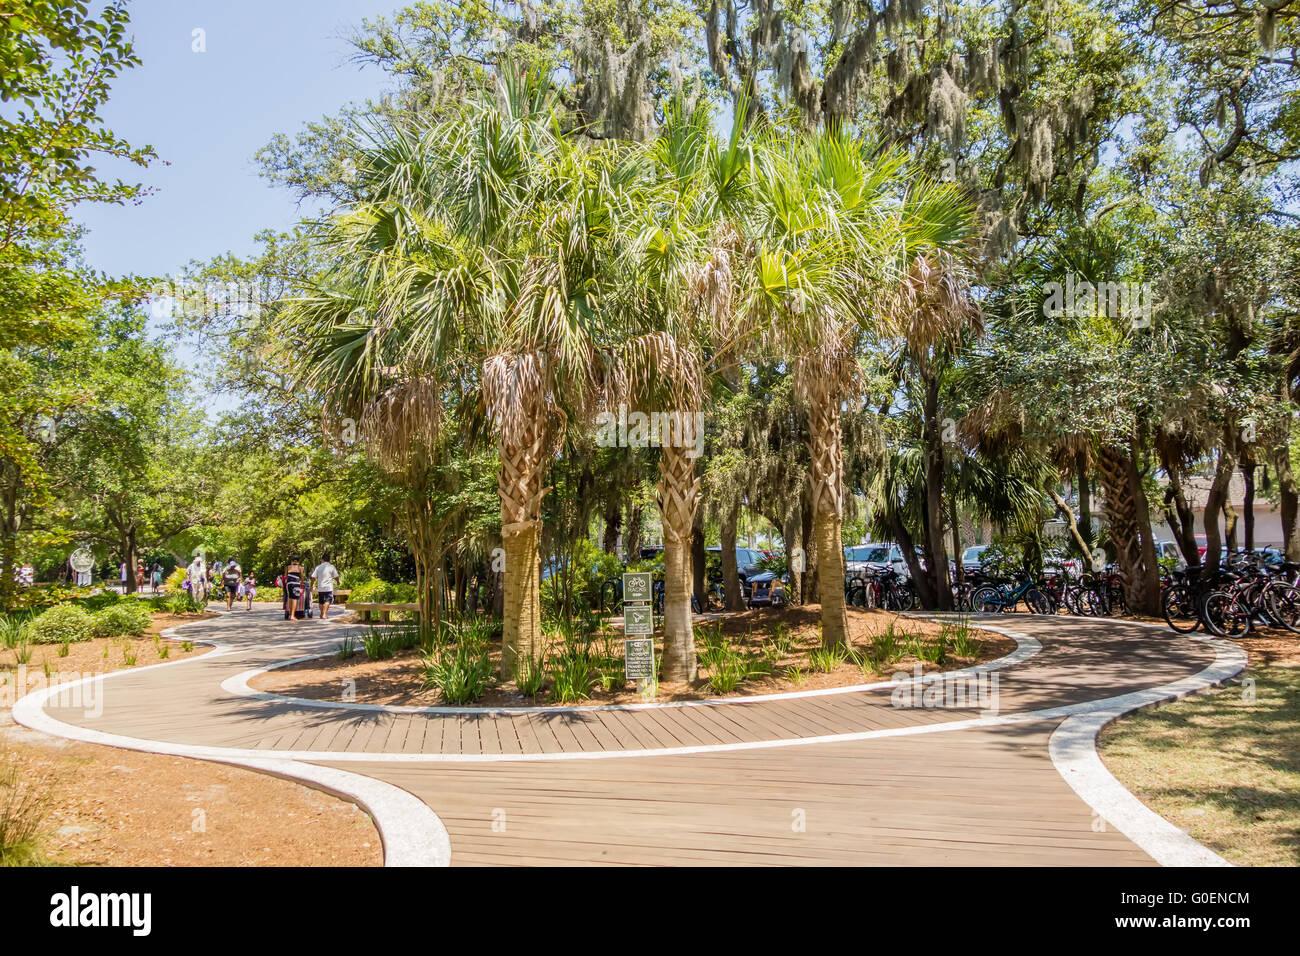 palm trees in georgia state usa Stock Photo: 103586356 - Alamy